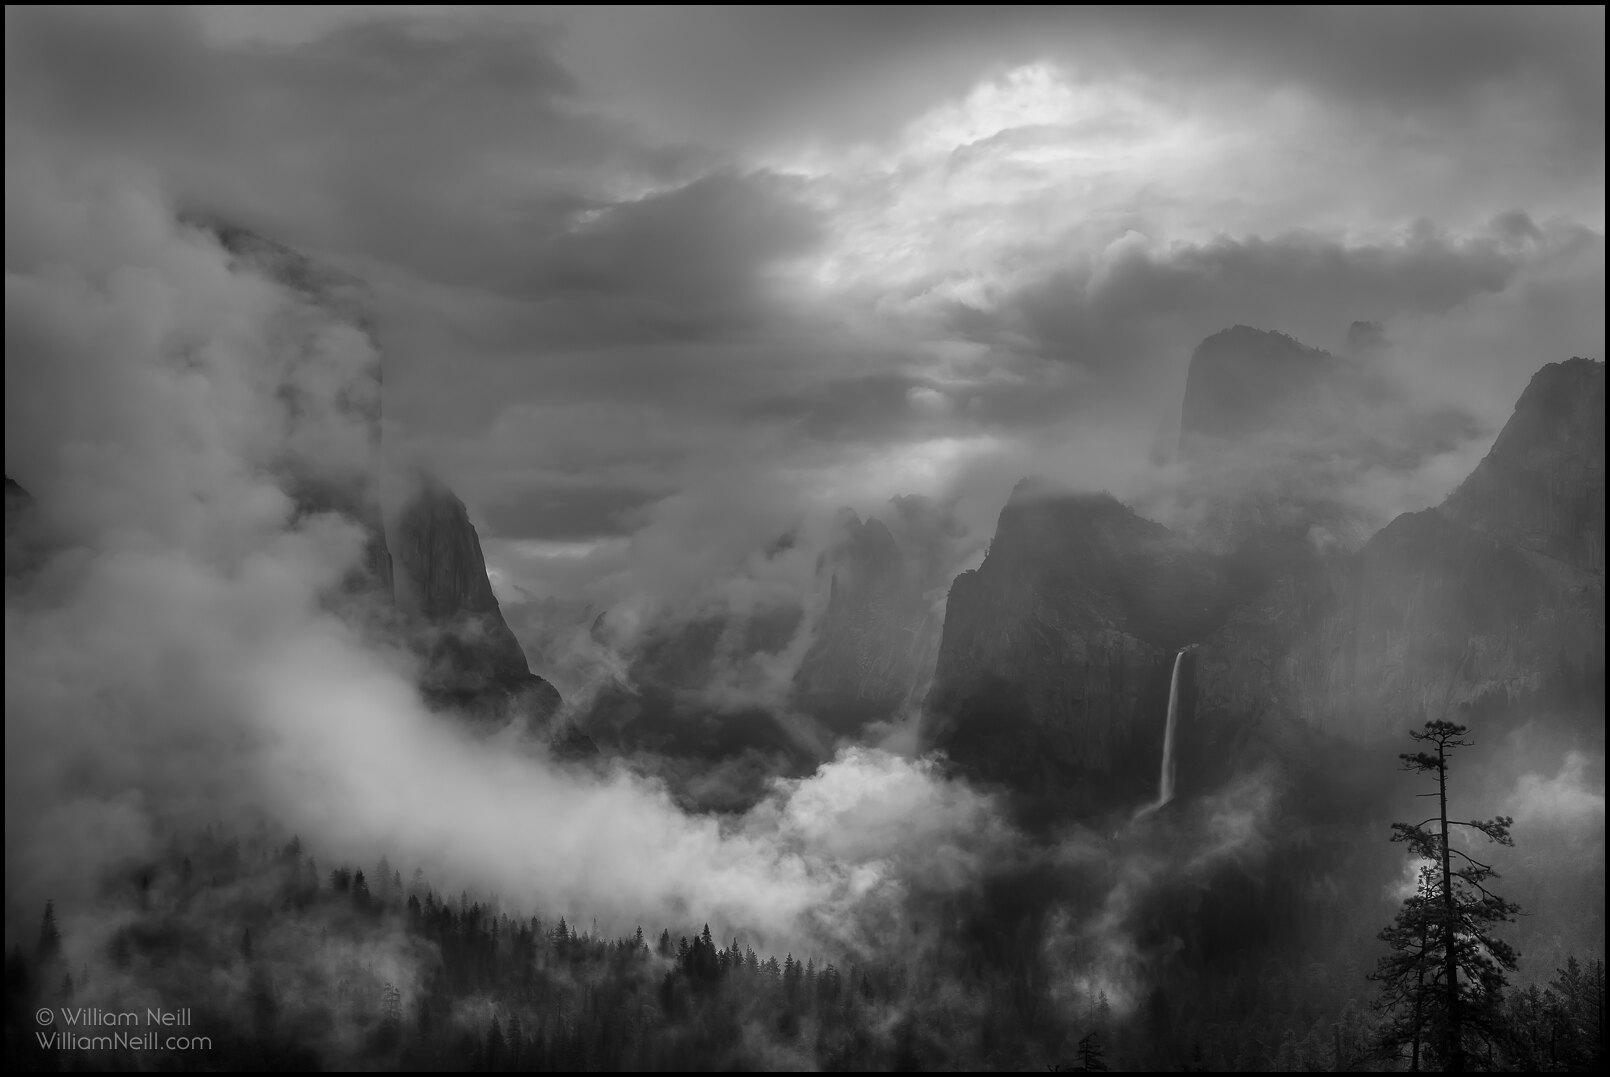 Canon 1DS Mark III, Nature, William Neill Photography, Yosemite National Park, national park, photo